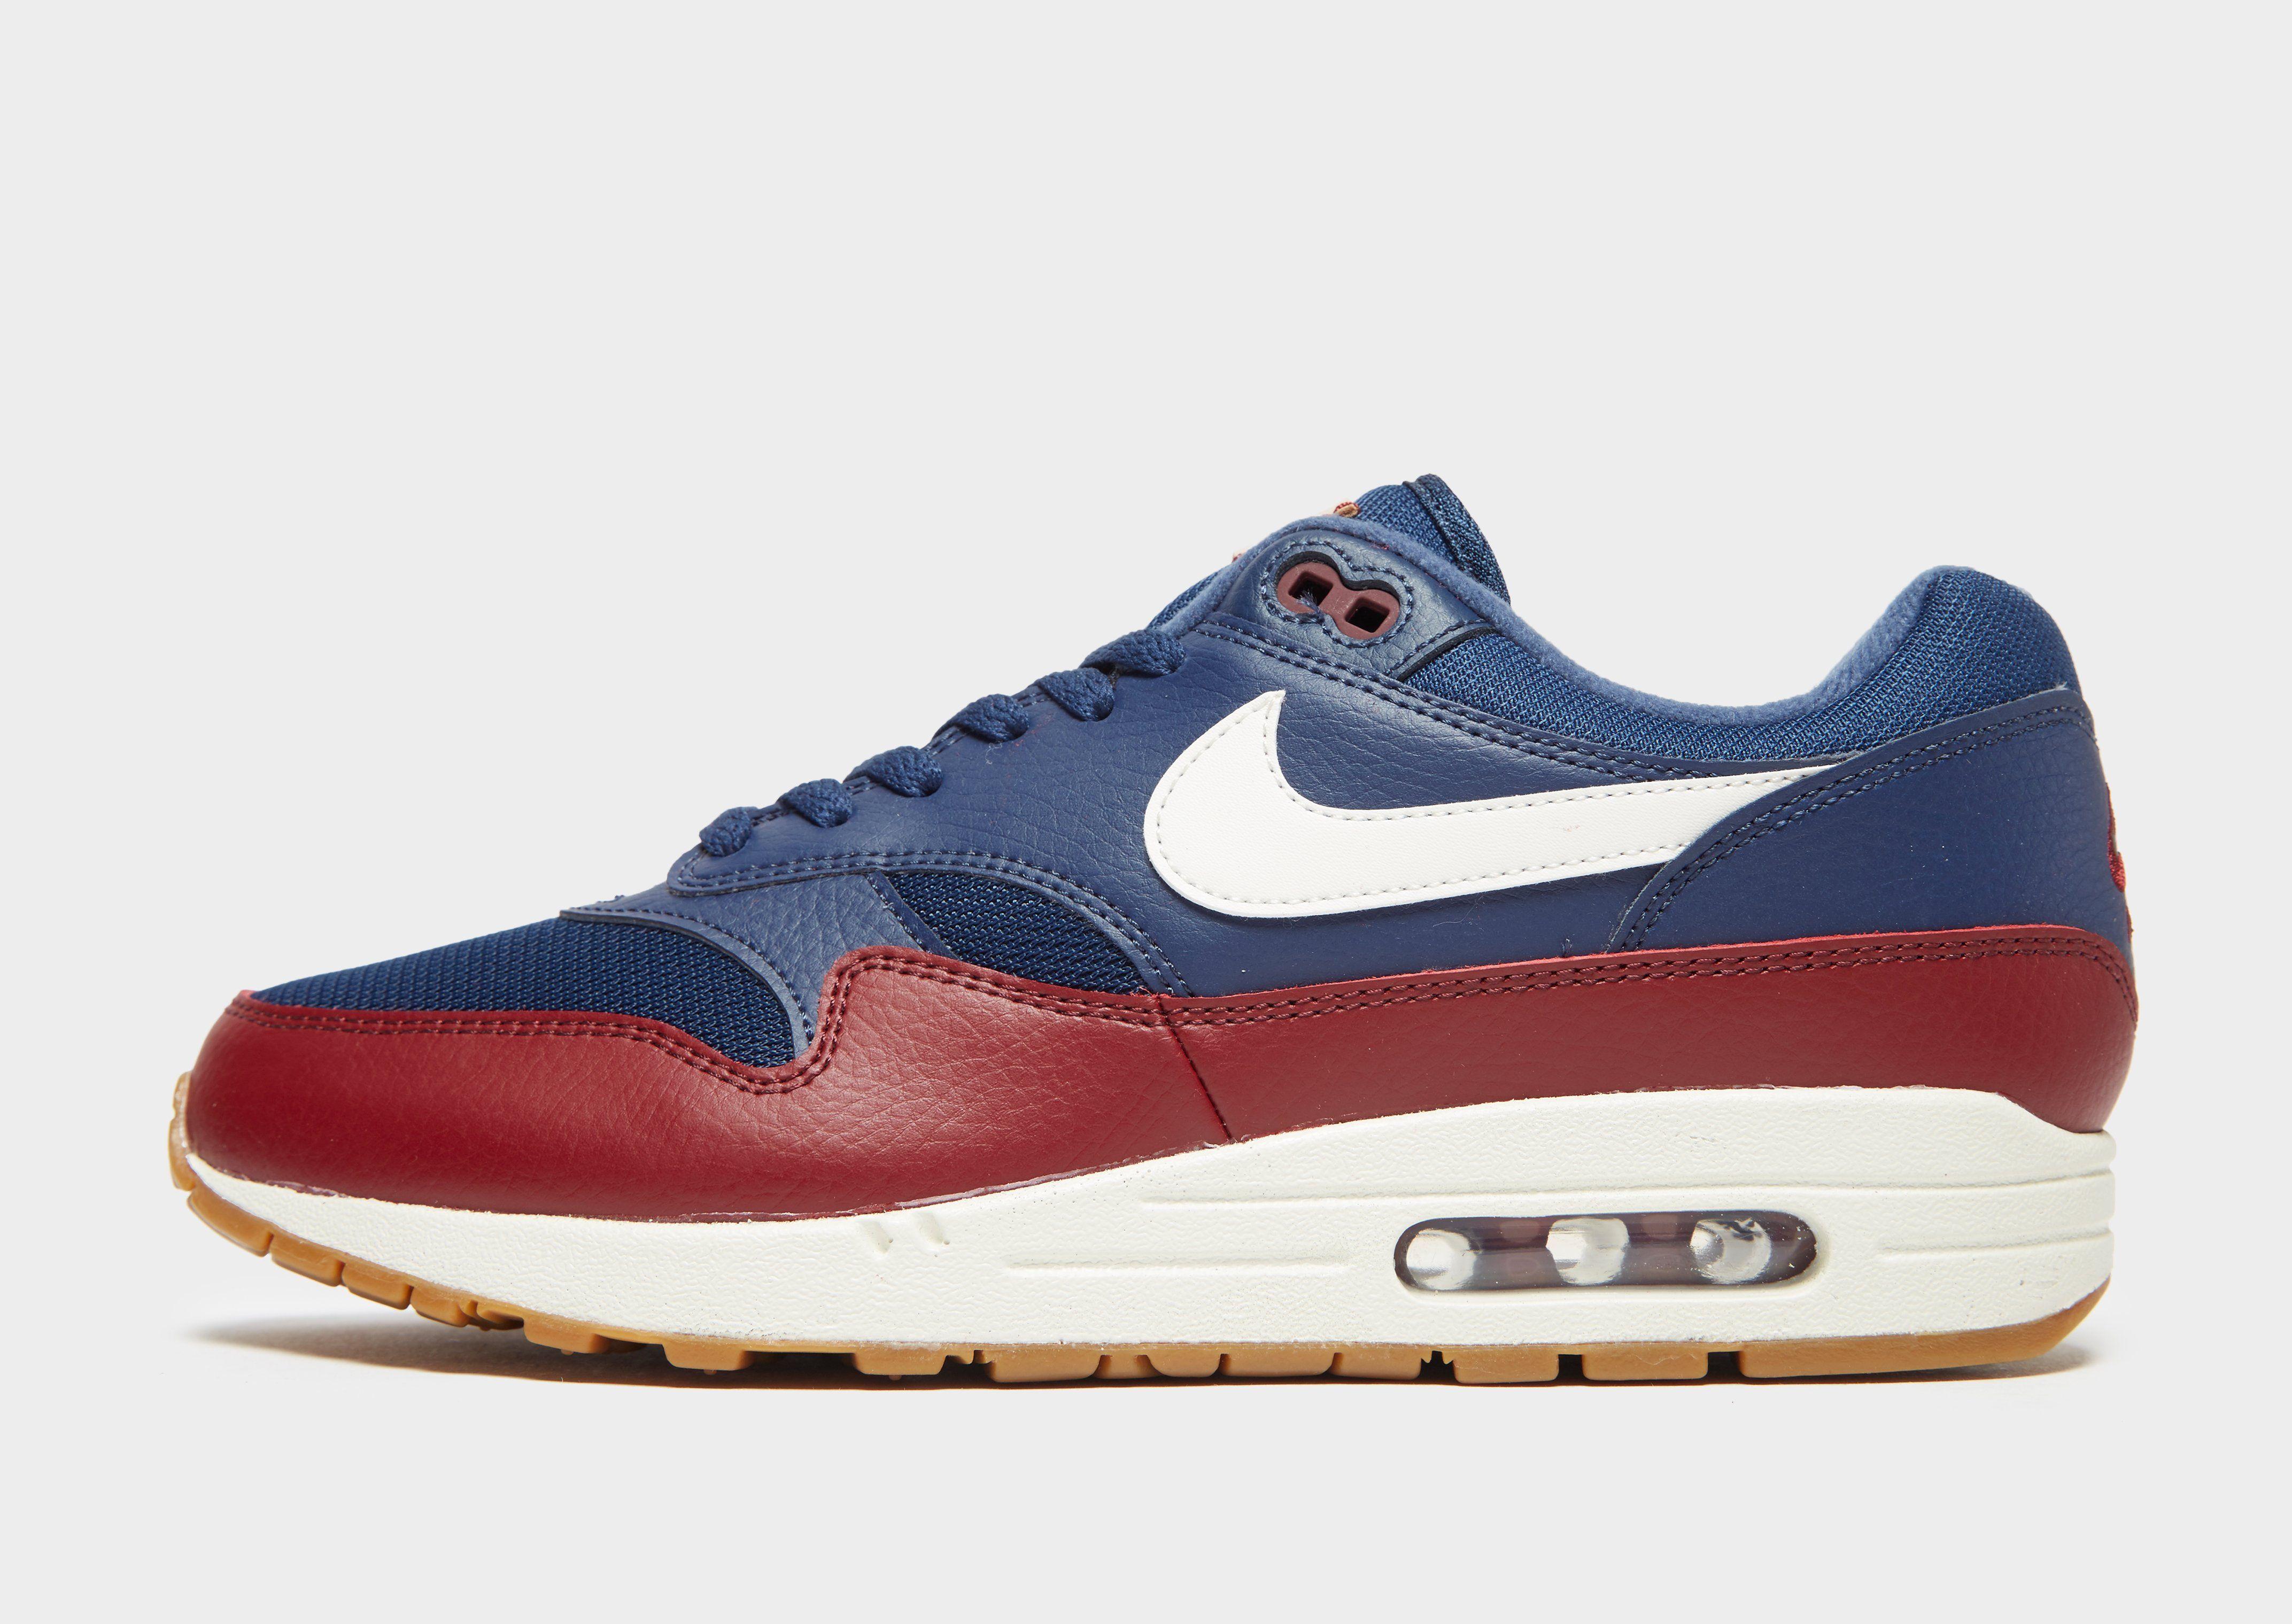 new style nike air max 1 essential blau and rot b030b a3020